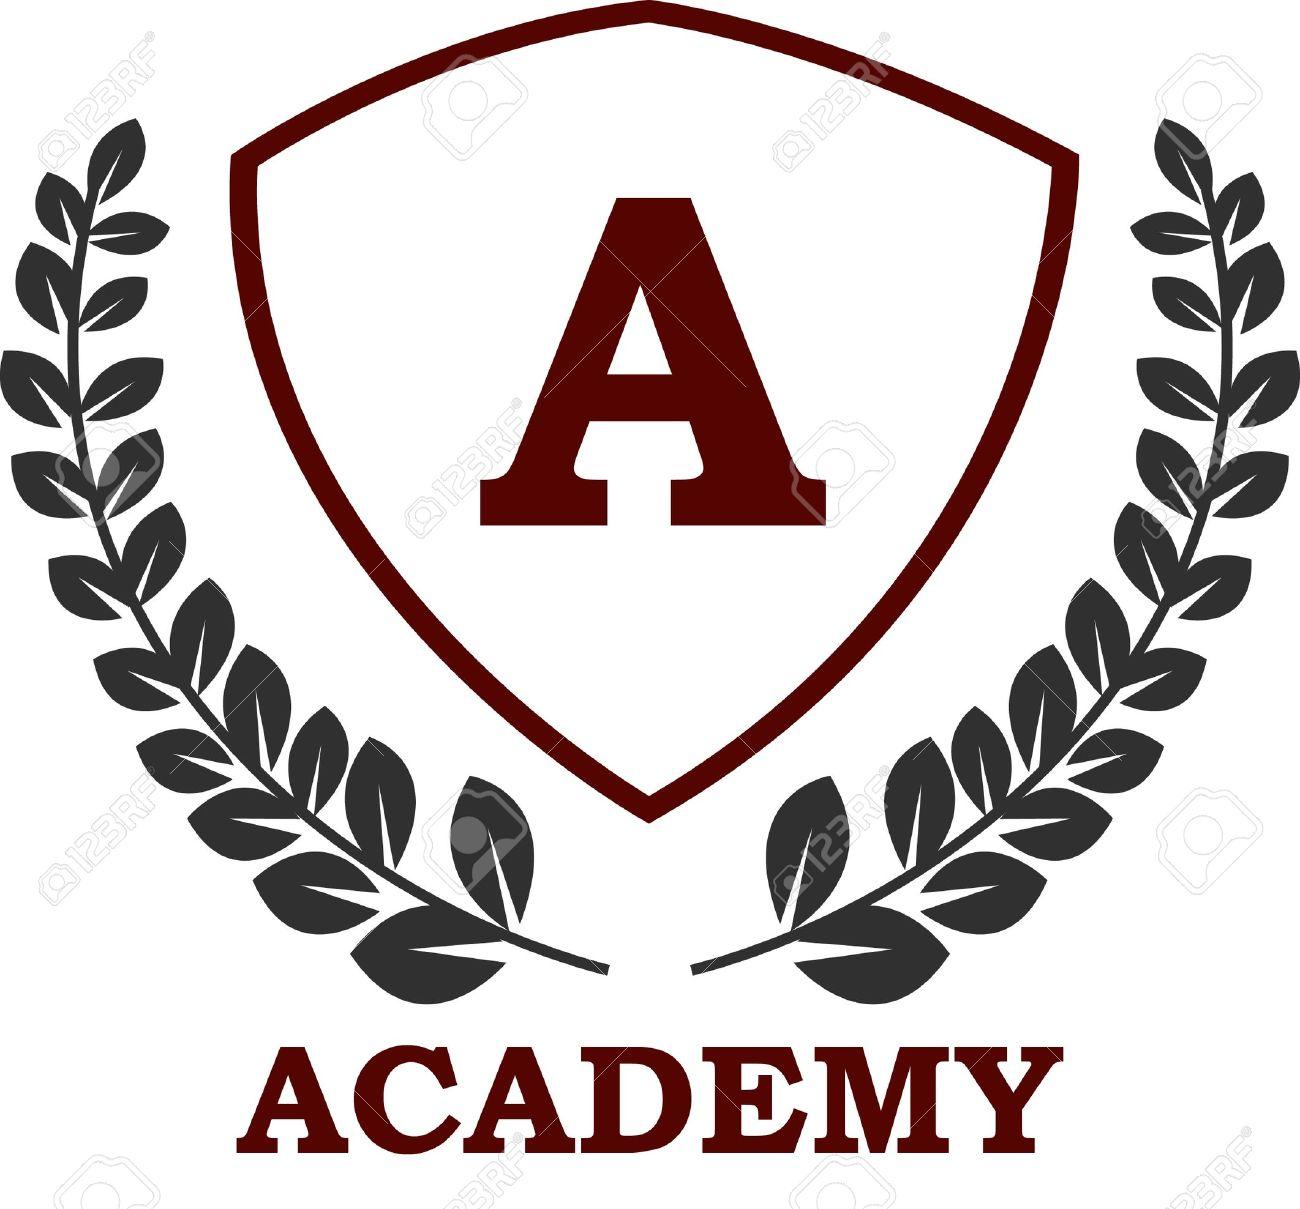 Academy school clipart.